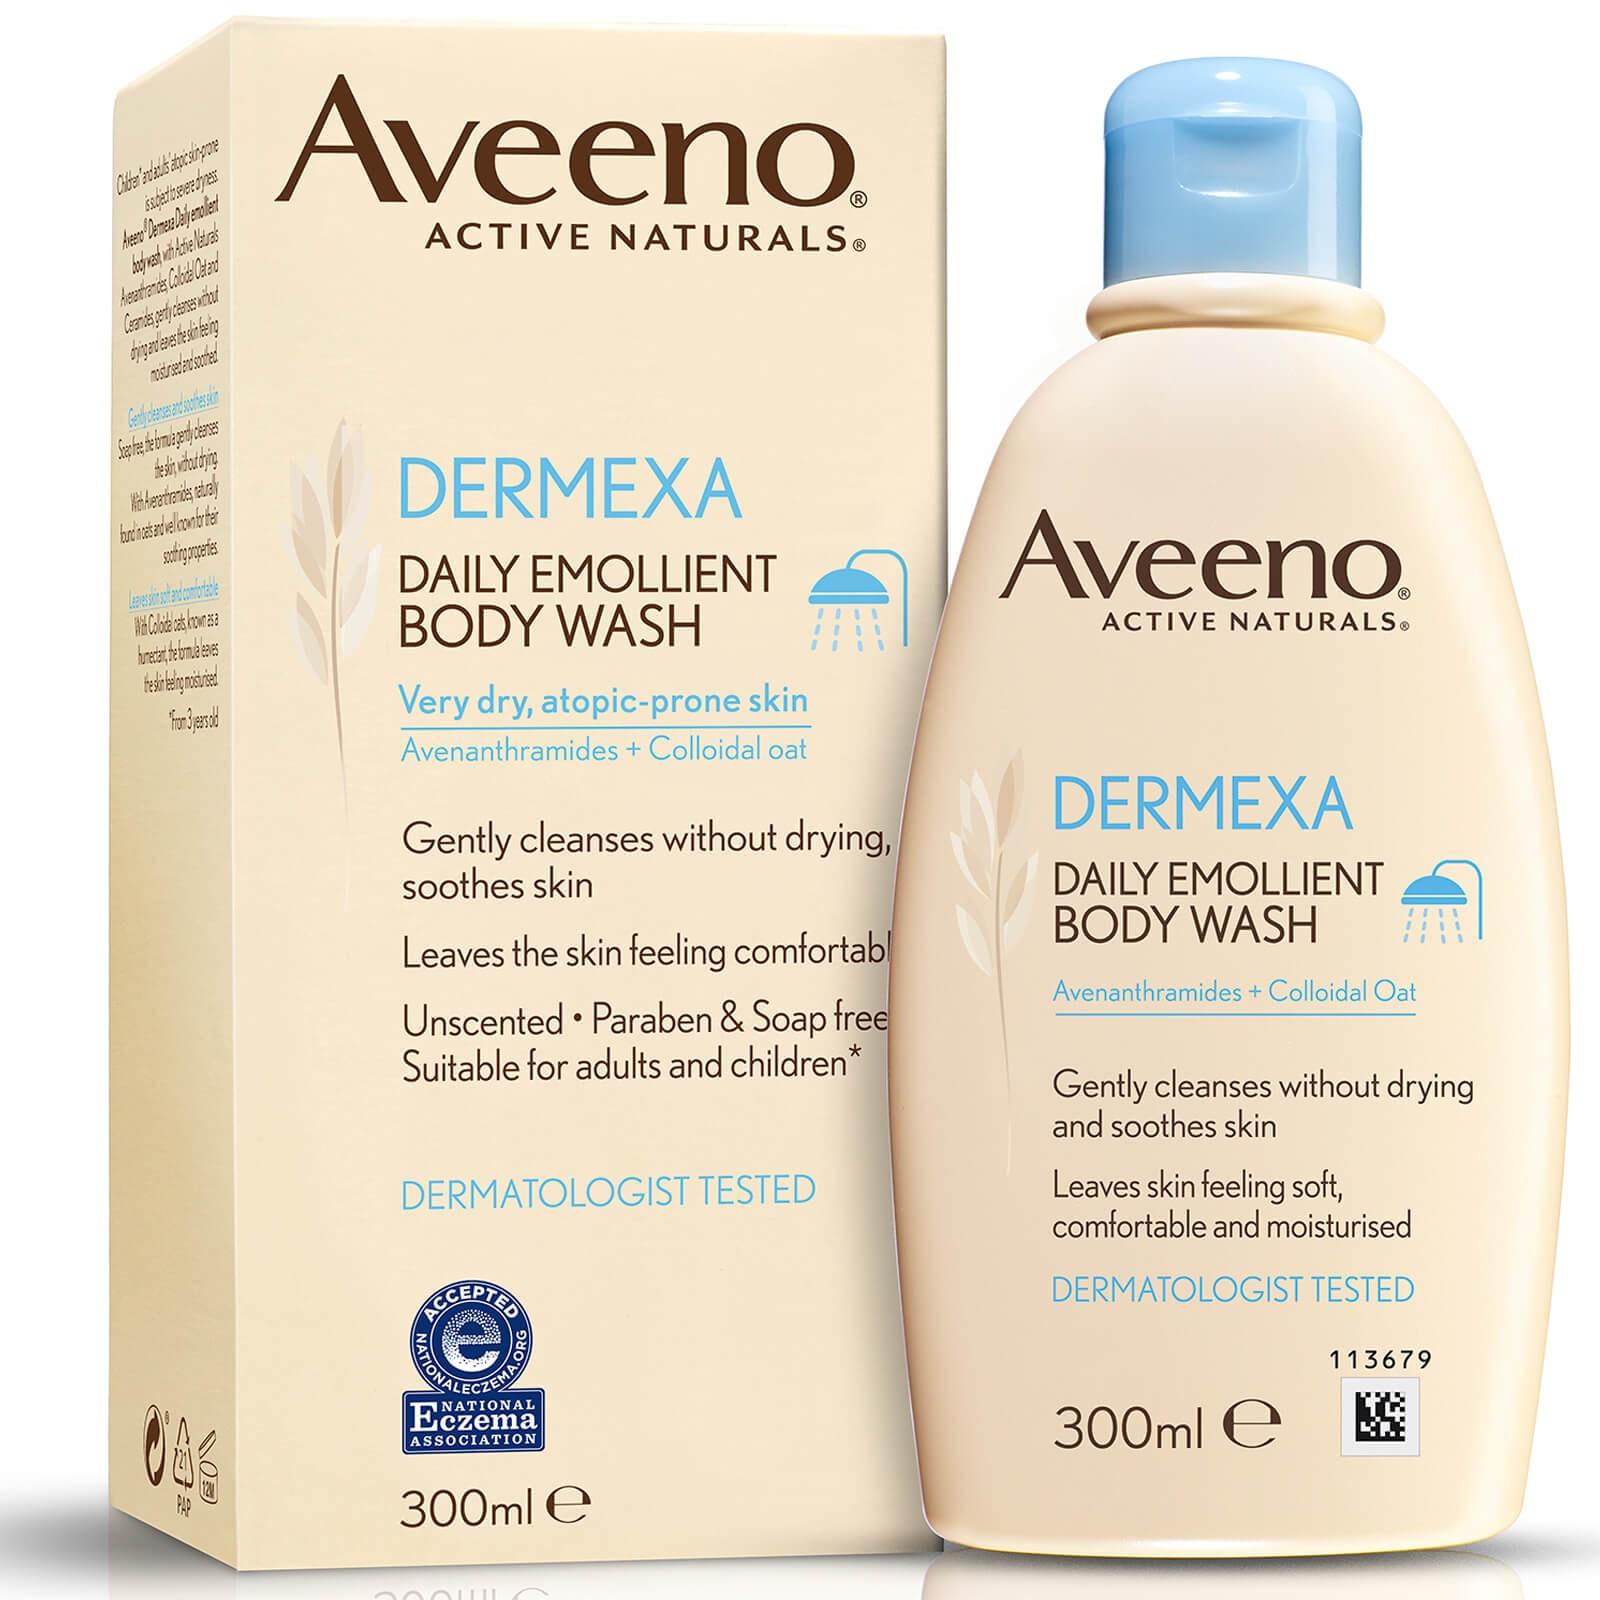 Aveeno Dermexa Emollient Body Wash